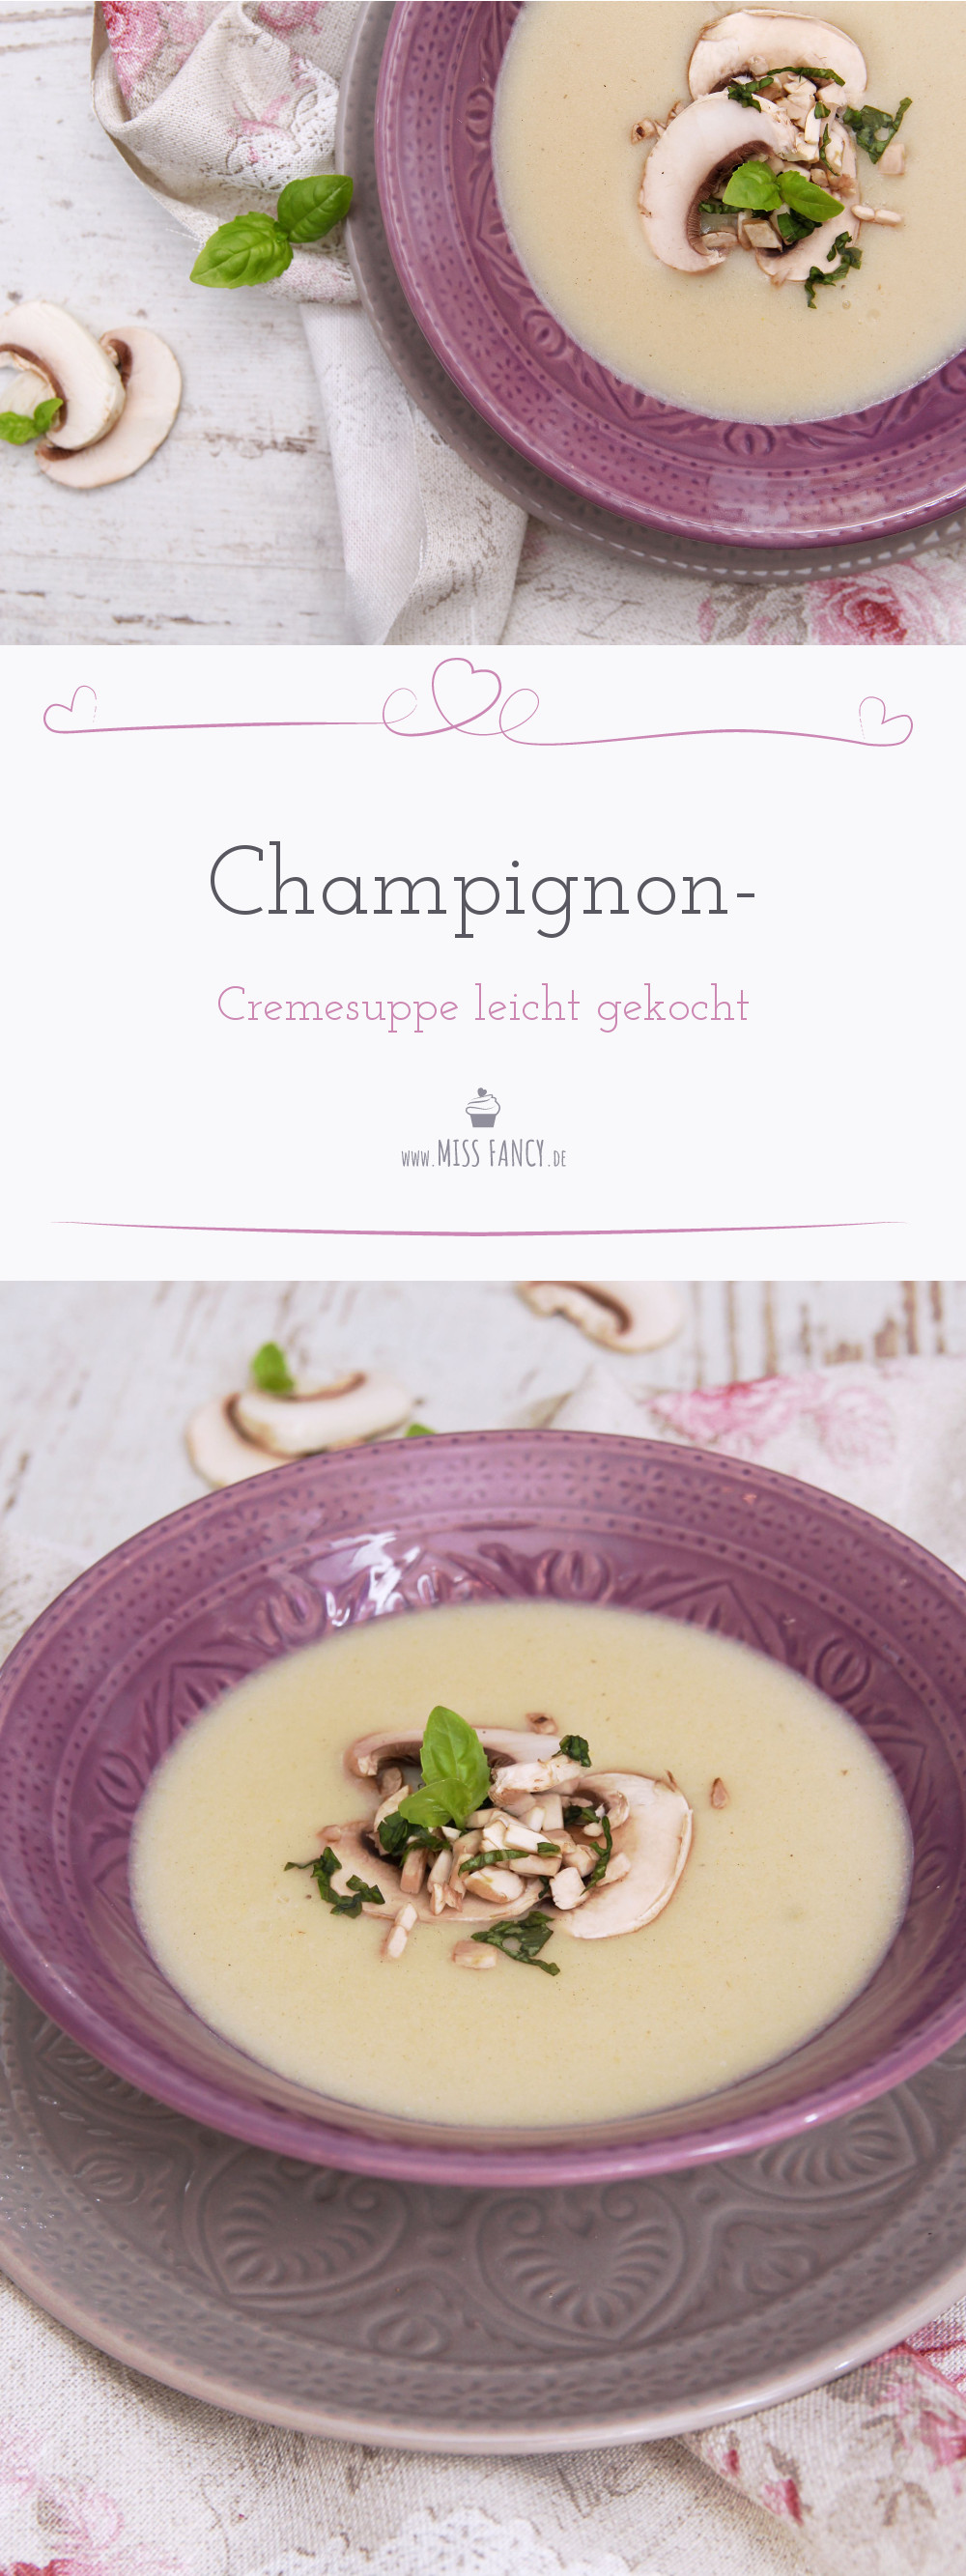 rezept-champignoncremesuppe-leicht-gekocht